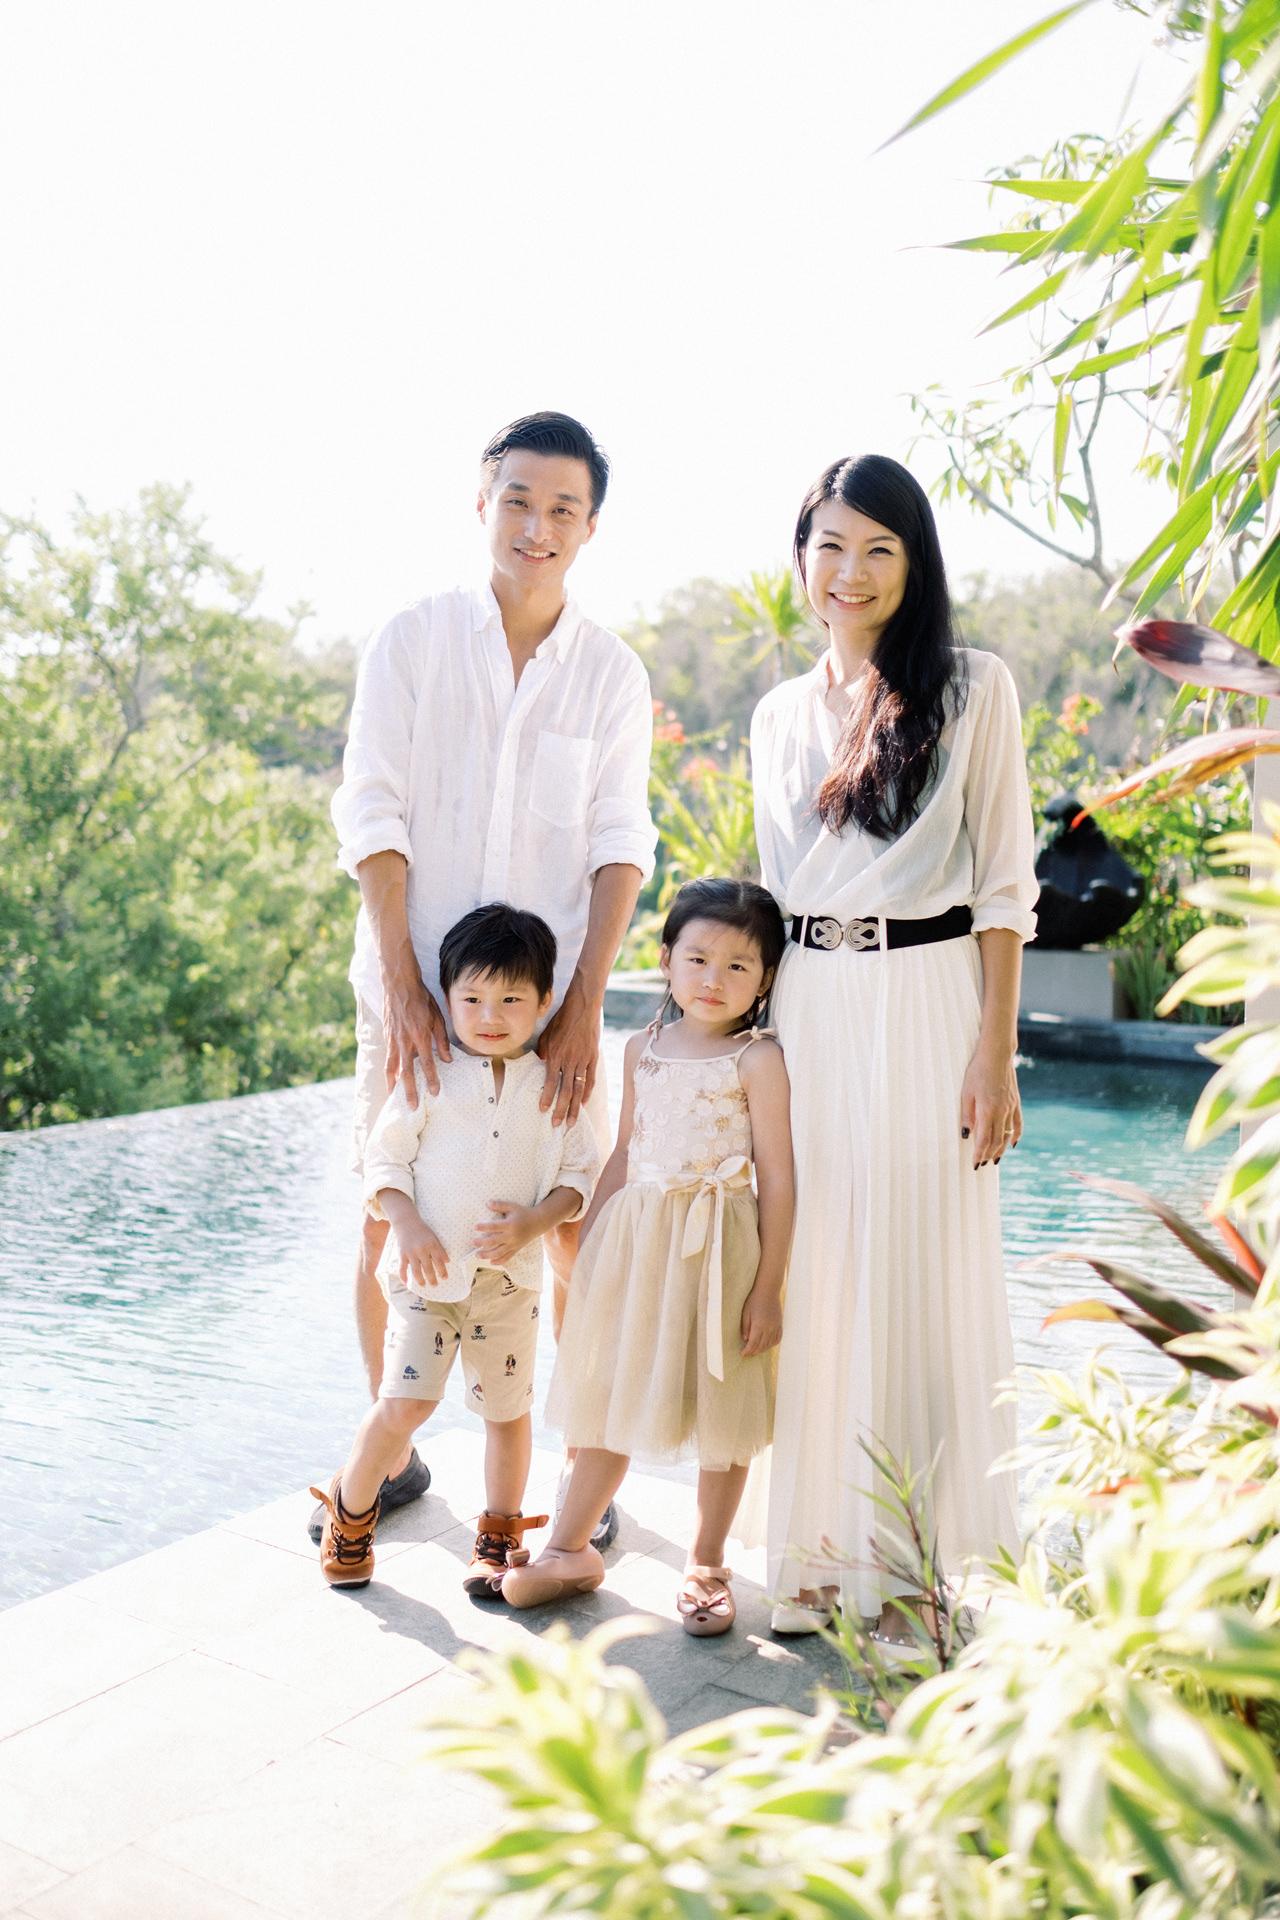 S&G: Bali Family Vacation Photo at The Beach 5